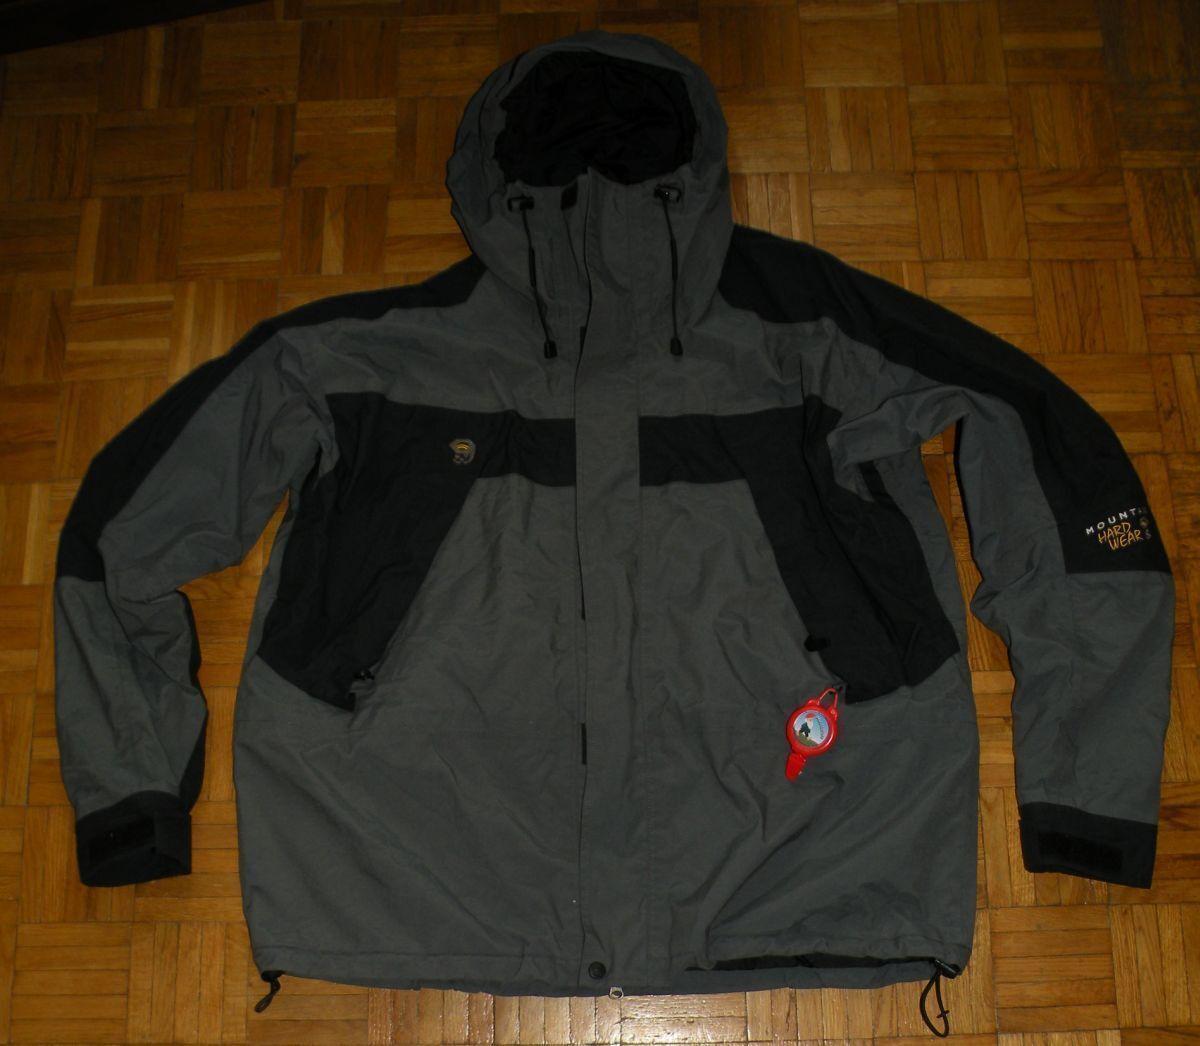 Mountain Hardwear XL Grigio Giacca con con con Cappuccio da Uomo Tubo Prossoettivo Giacca Campeggio hikking 3edeba